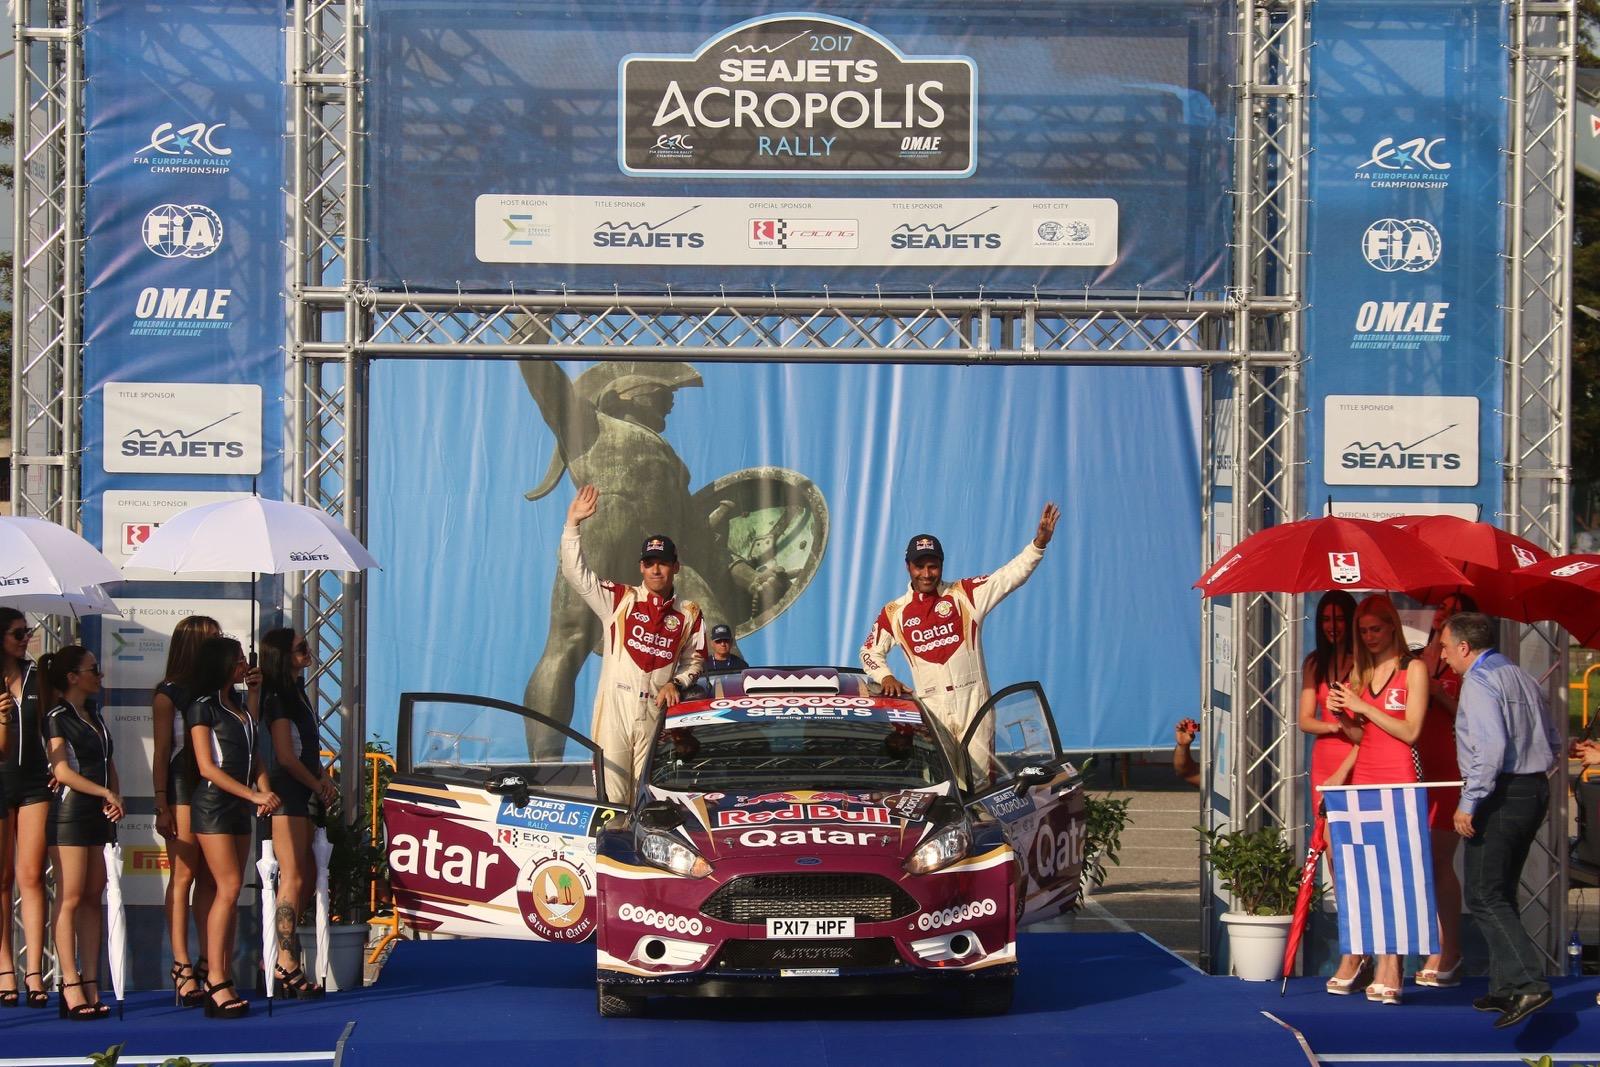 Rally_Acropolis_2017_Ceremonial_Start_05